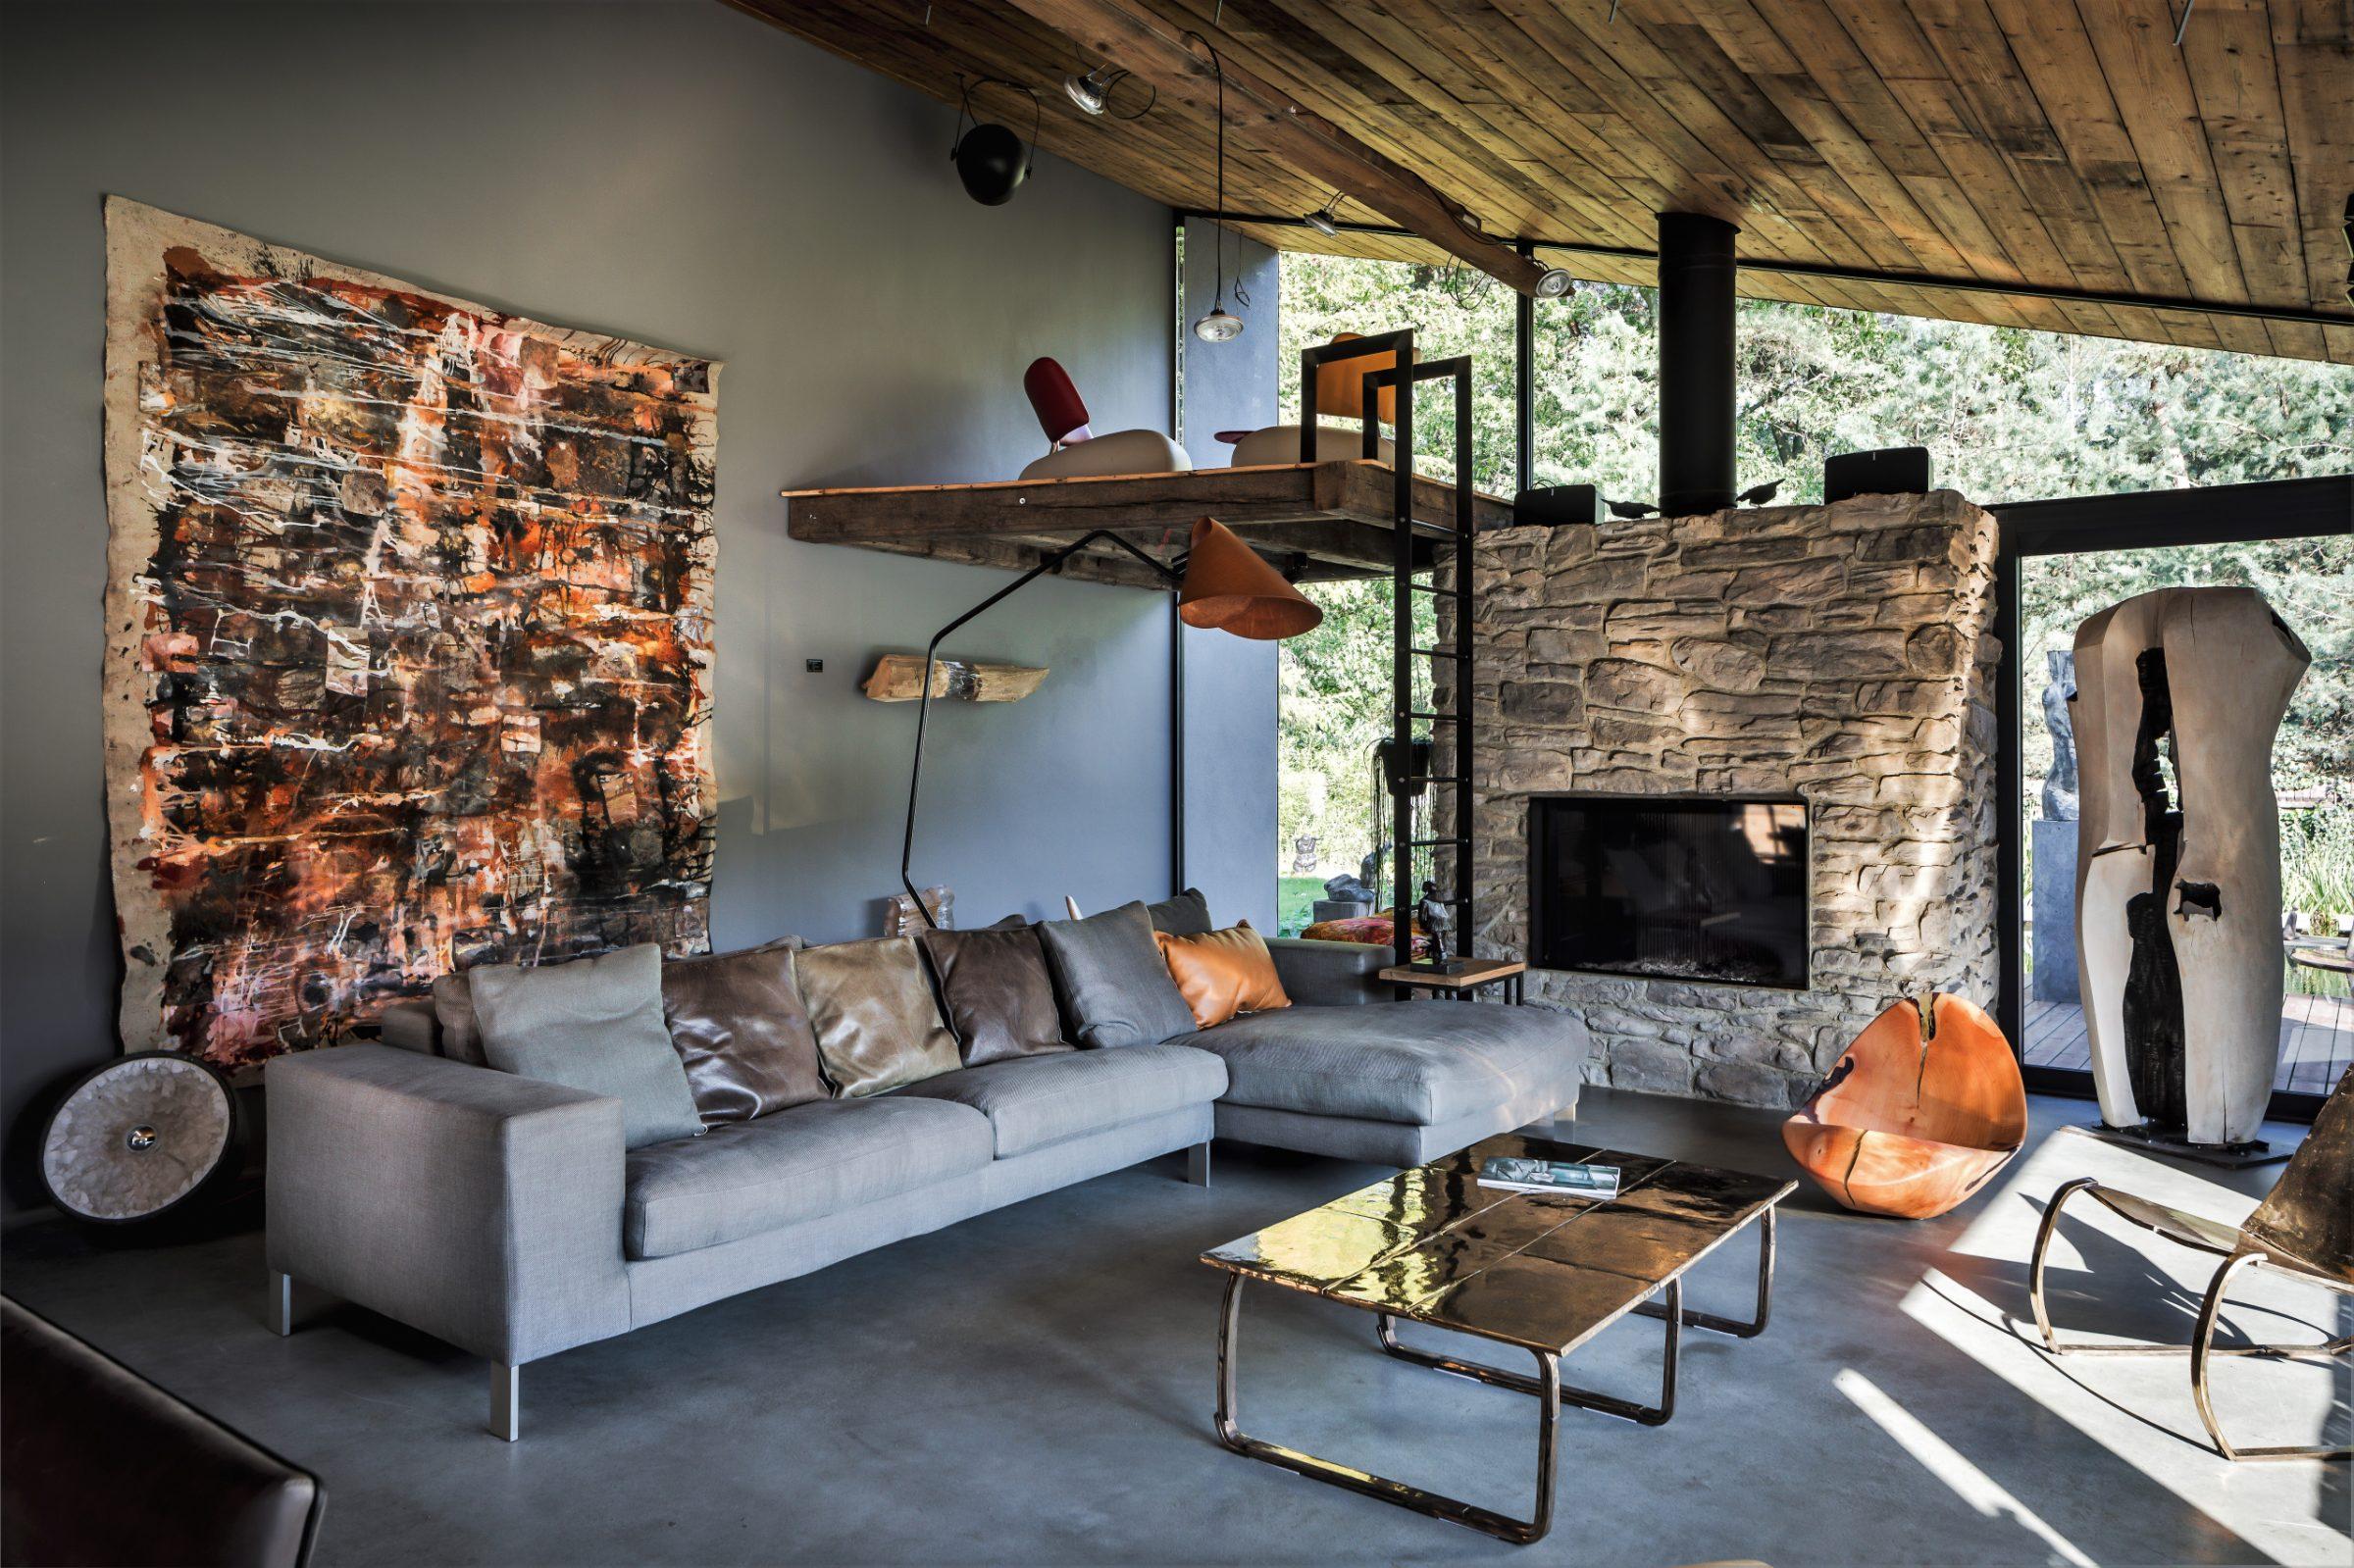 Cascata Steenstrips woonkamer. Ontwerp van Tom Kneepkens, Architect.